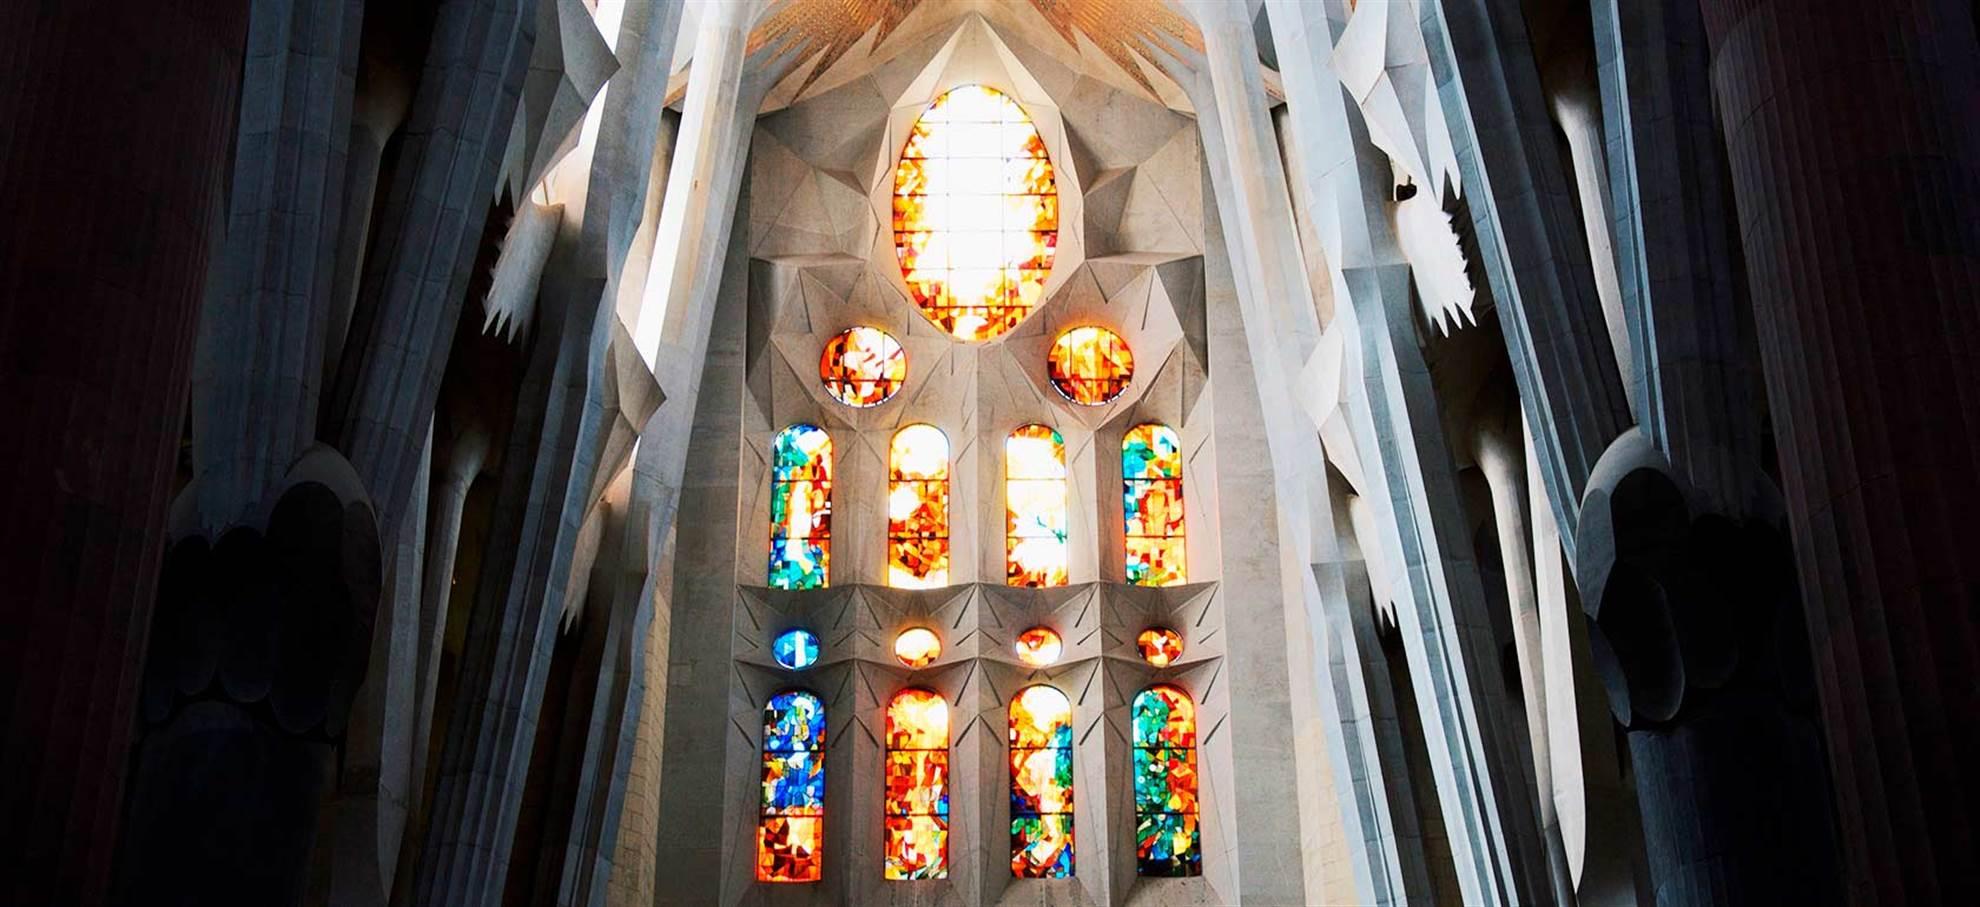 Guidet La Sagrada Familia tur. Spring køen over!